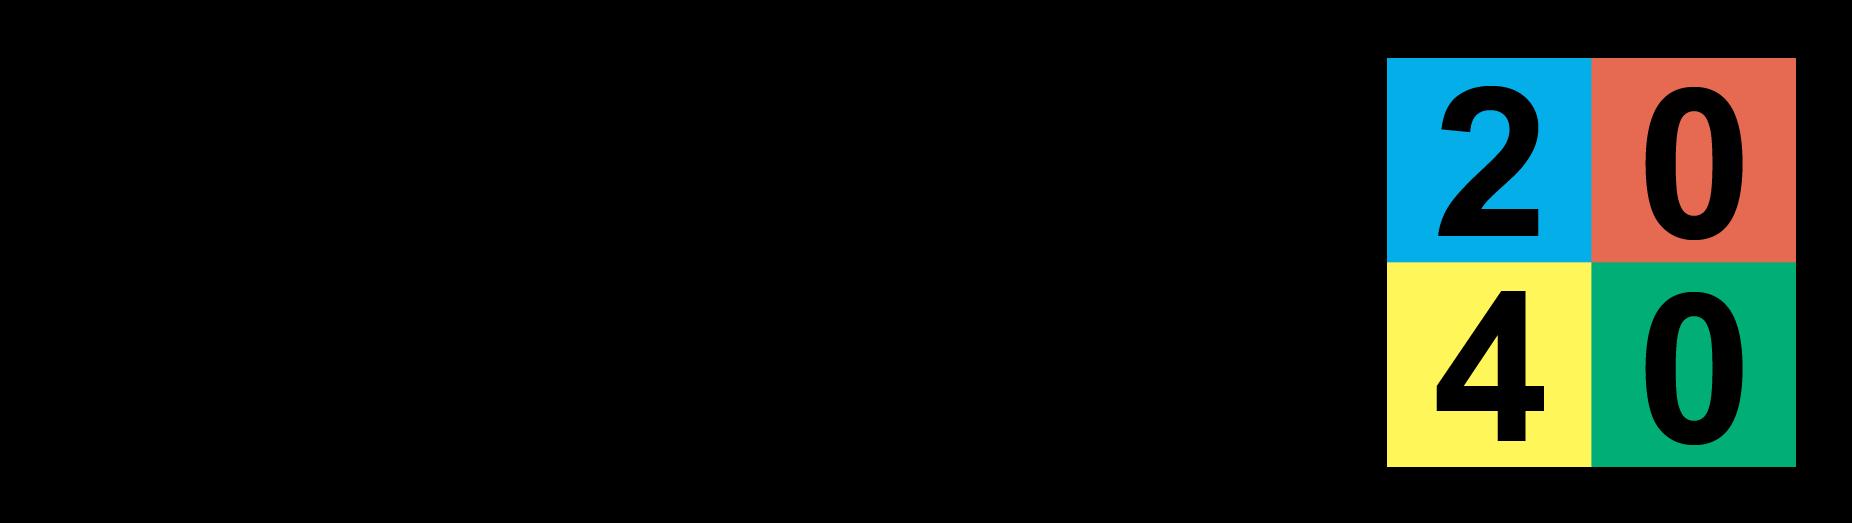 Melsungen2040